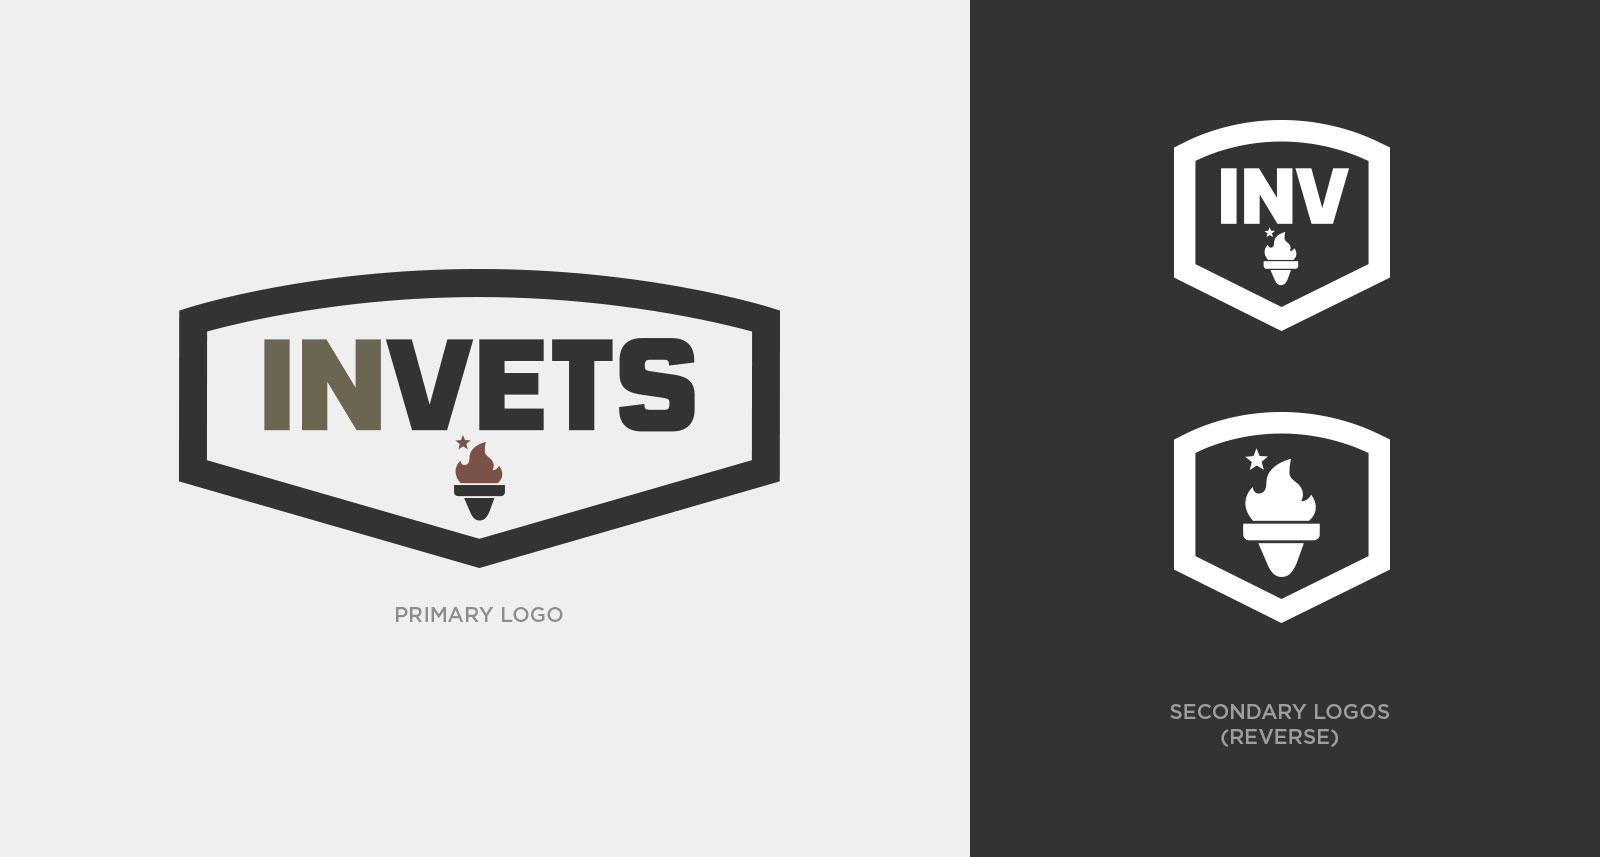 INvets Logos